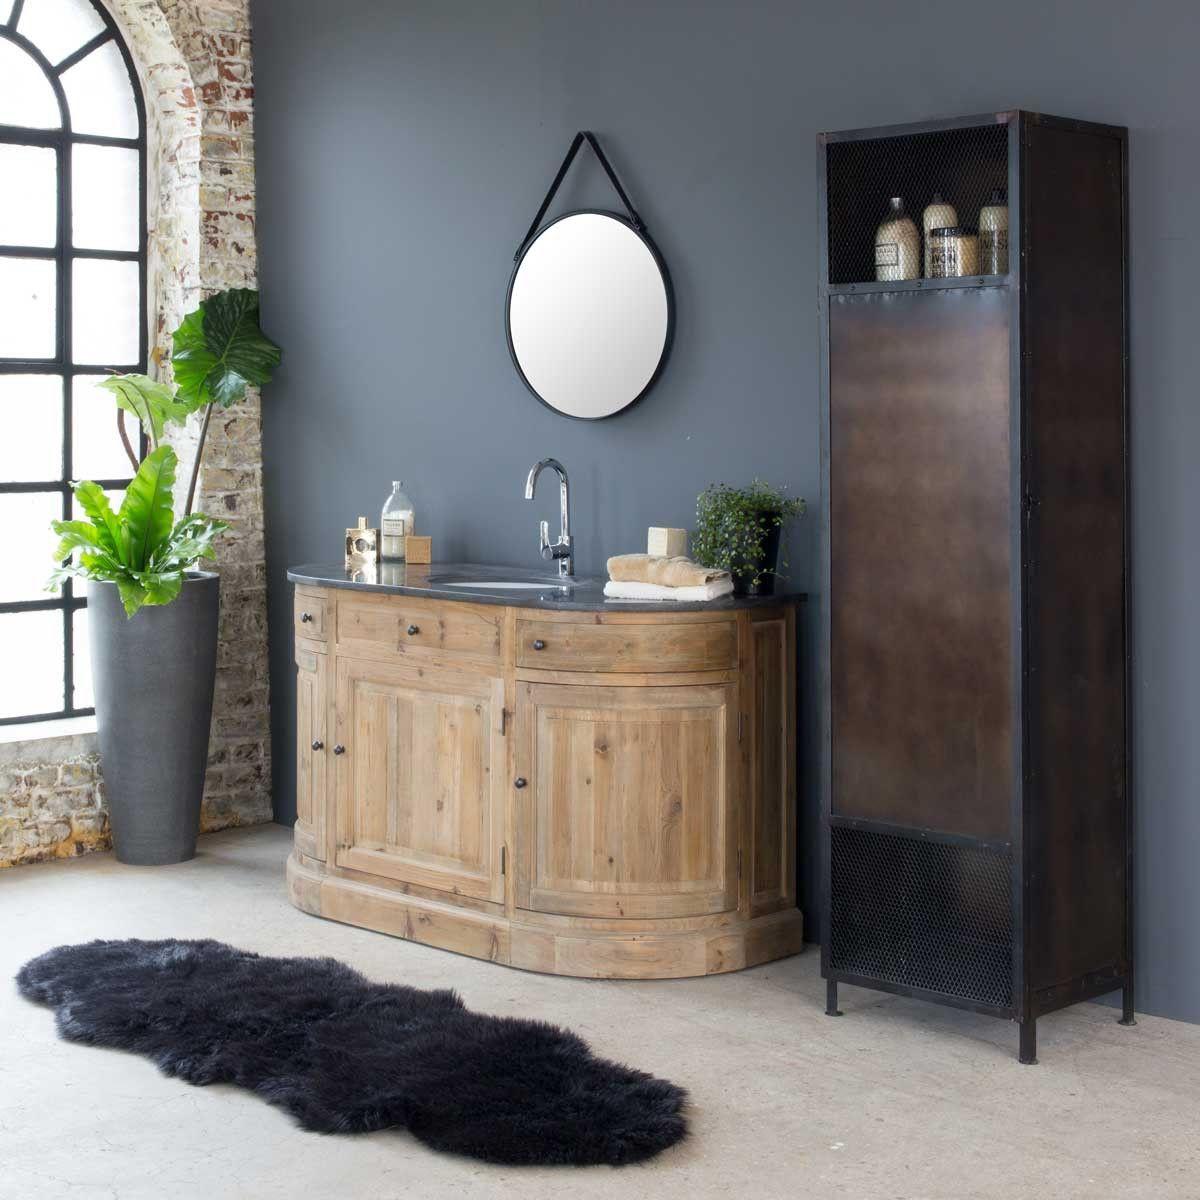 Meuble salle de bain bois massif arrondi 16 vasque, 16 portes, 16